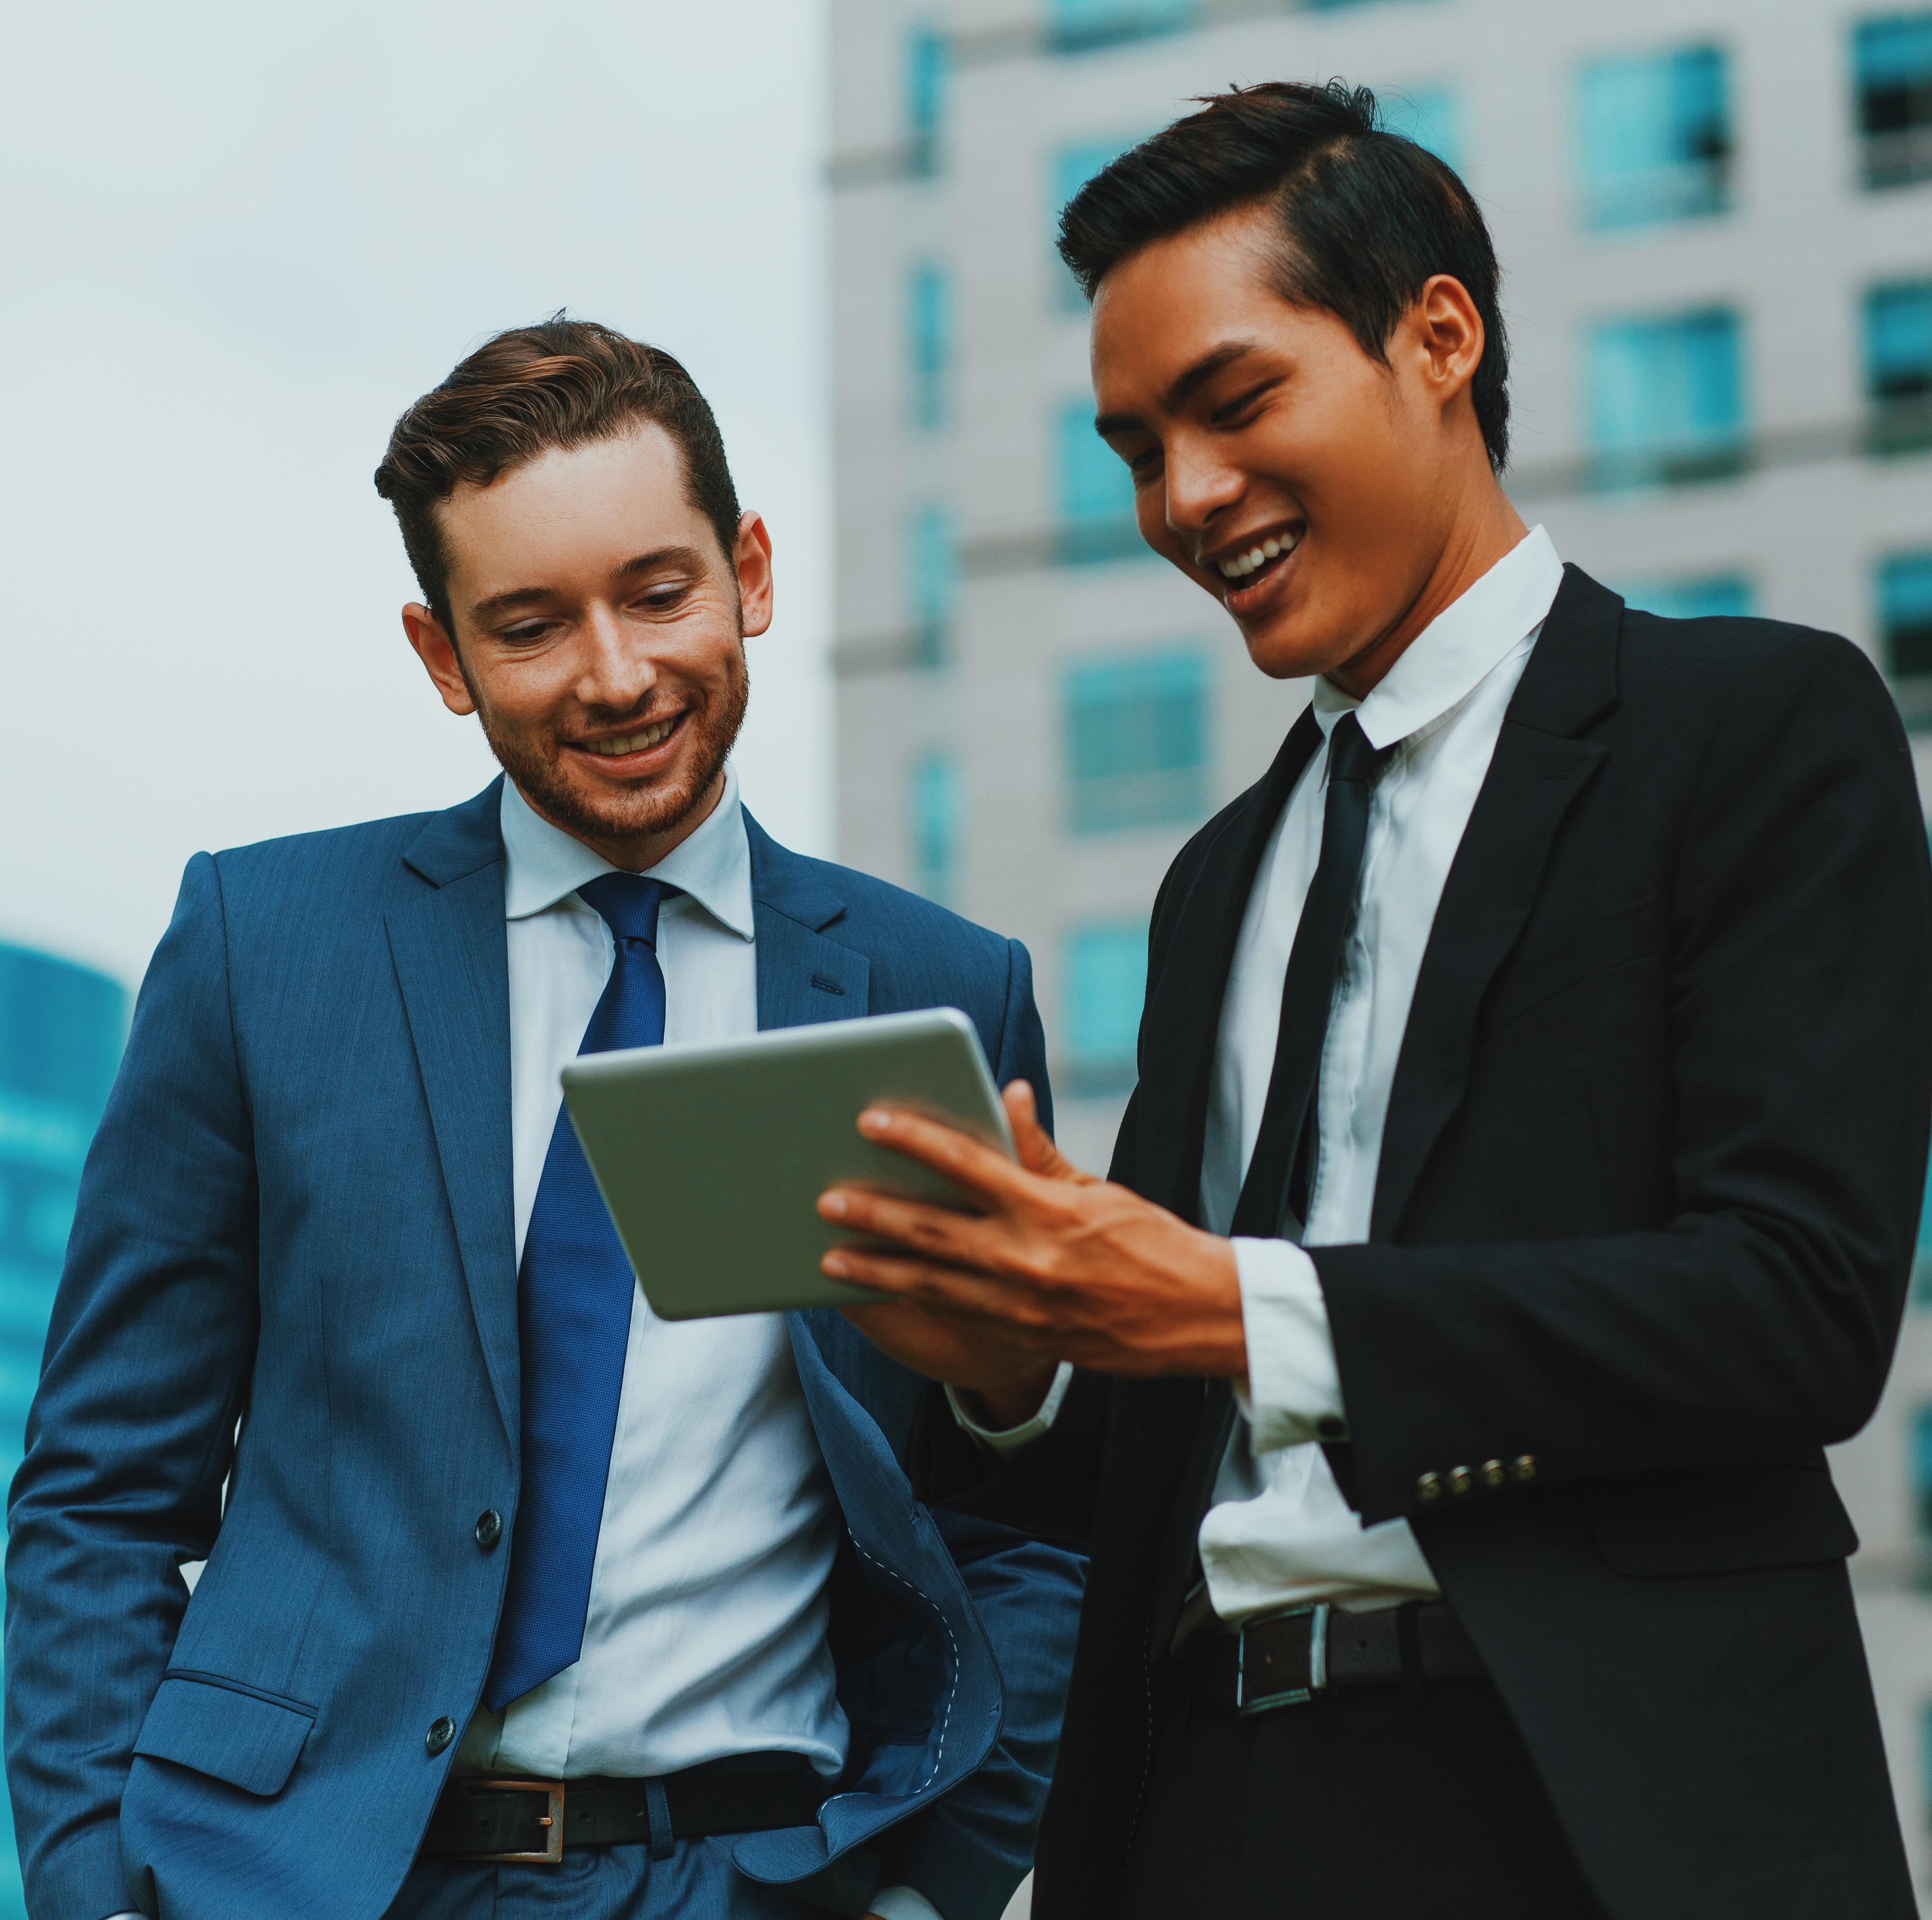 Professional Business Men Discussing